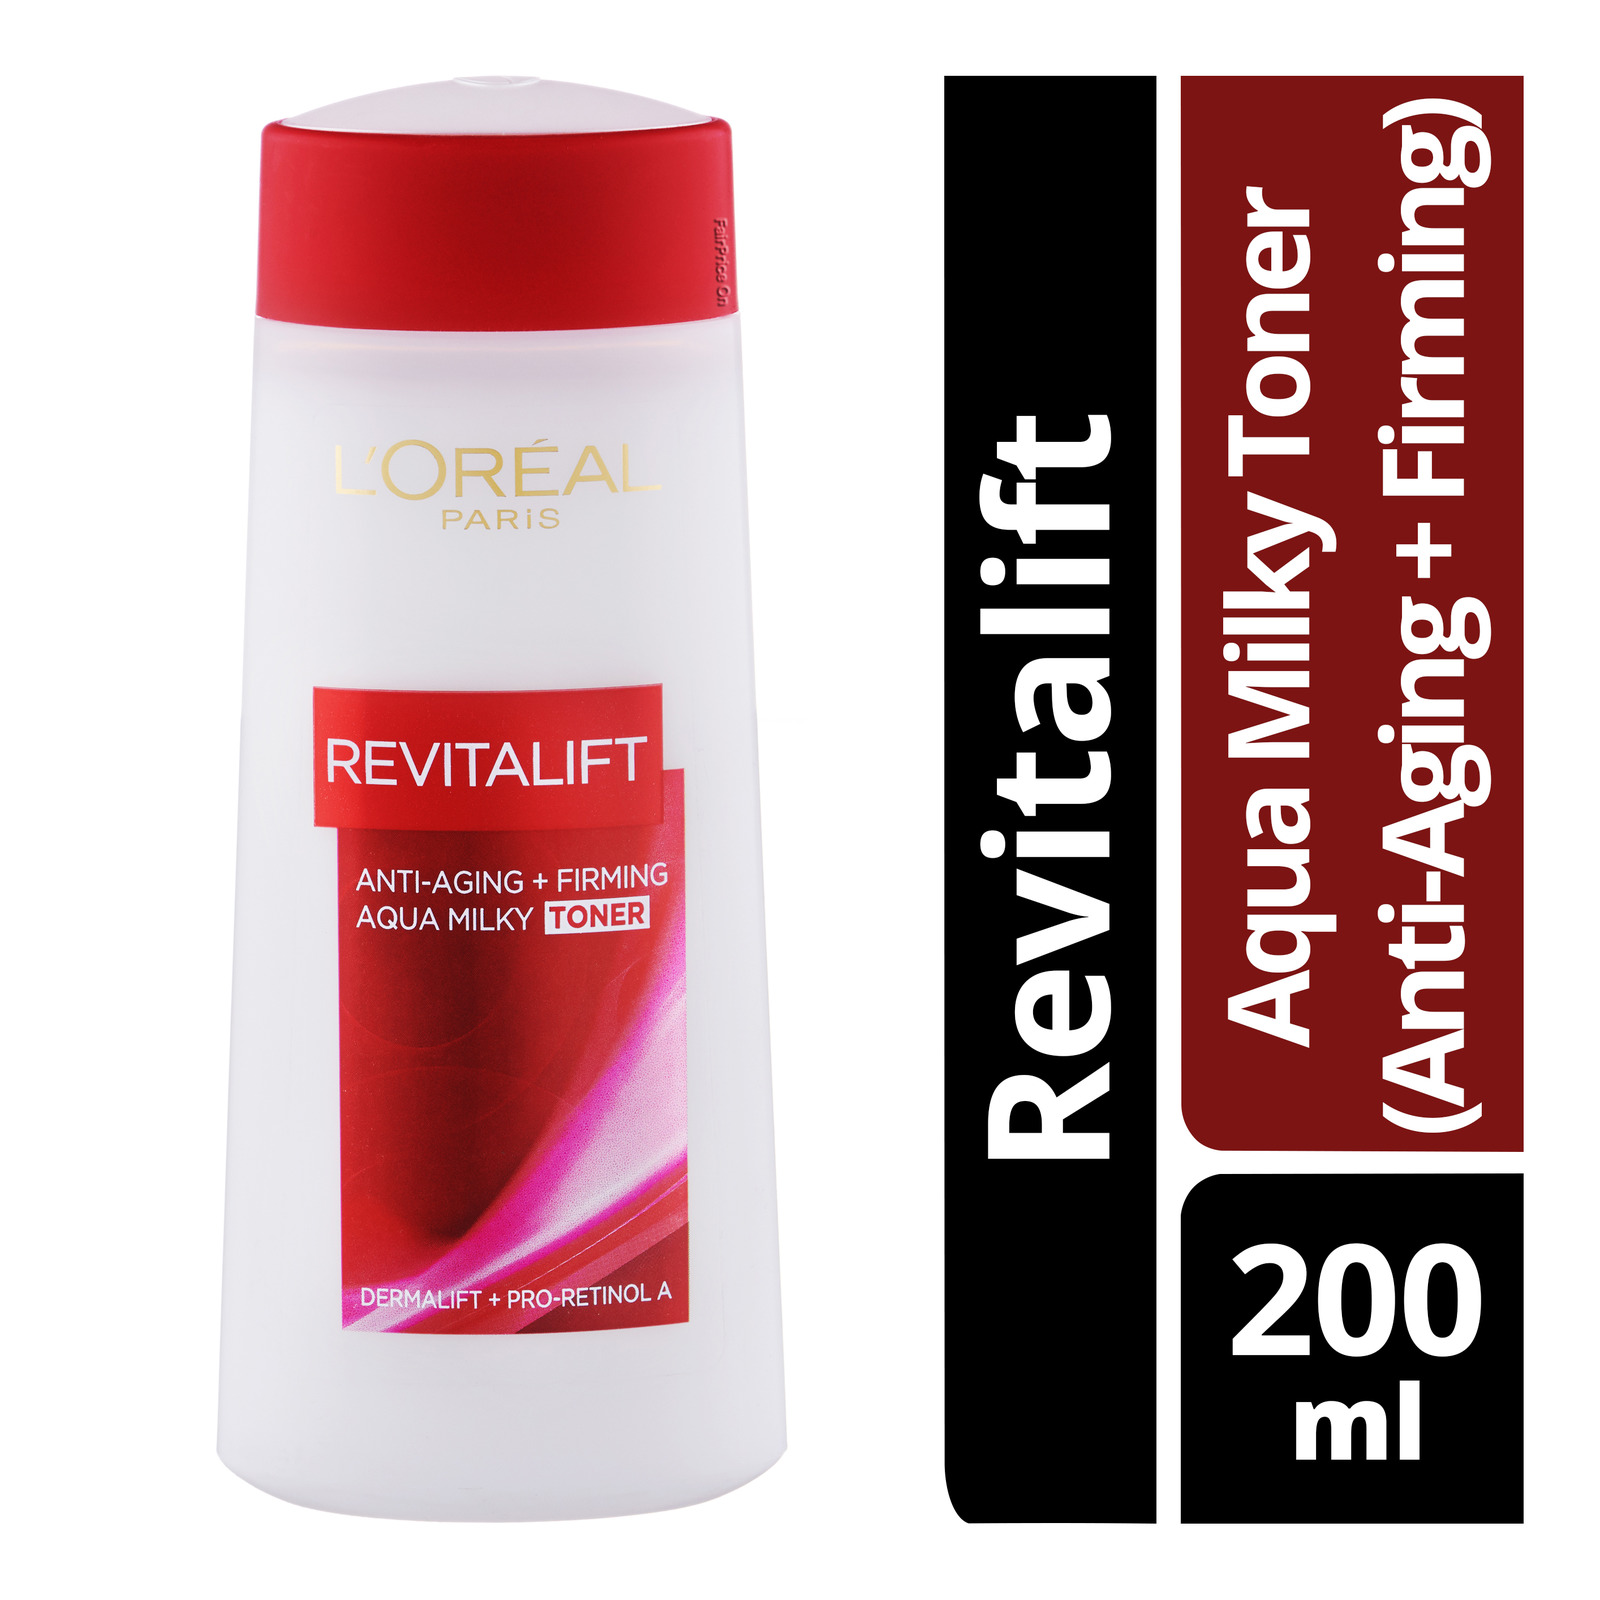 L'Oreal Paris Revitalift Aqua Milky Toner - Anti-Aging + Firming